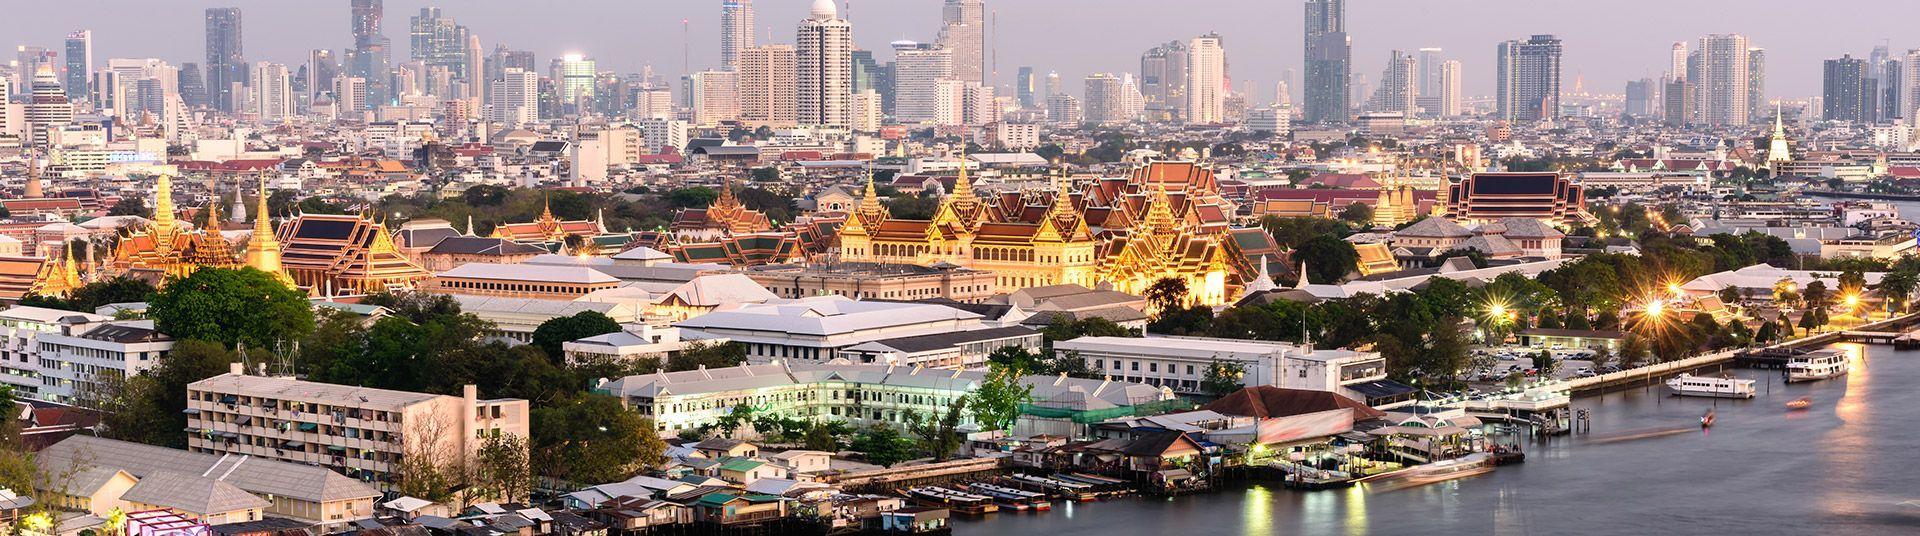 vol bangkok bkk billet d 39 avion bangkok pas cher avec. Black Bedroom Furniture Sets. Home Design Ideas